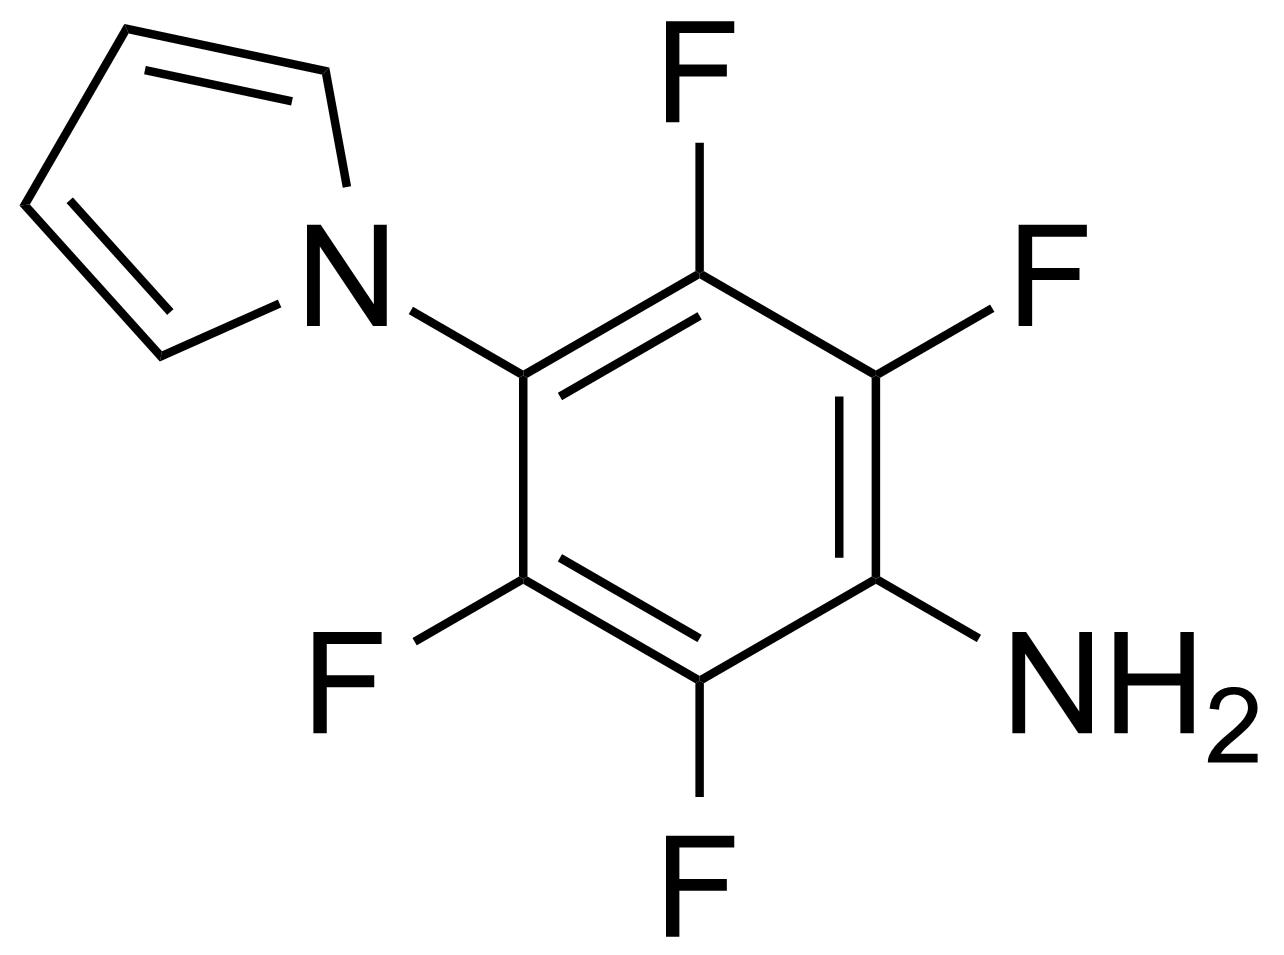 Structure of 2,3,5,6-Tetrafluoro-4-(1H-pyrrol-1-yl)aniline